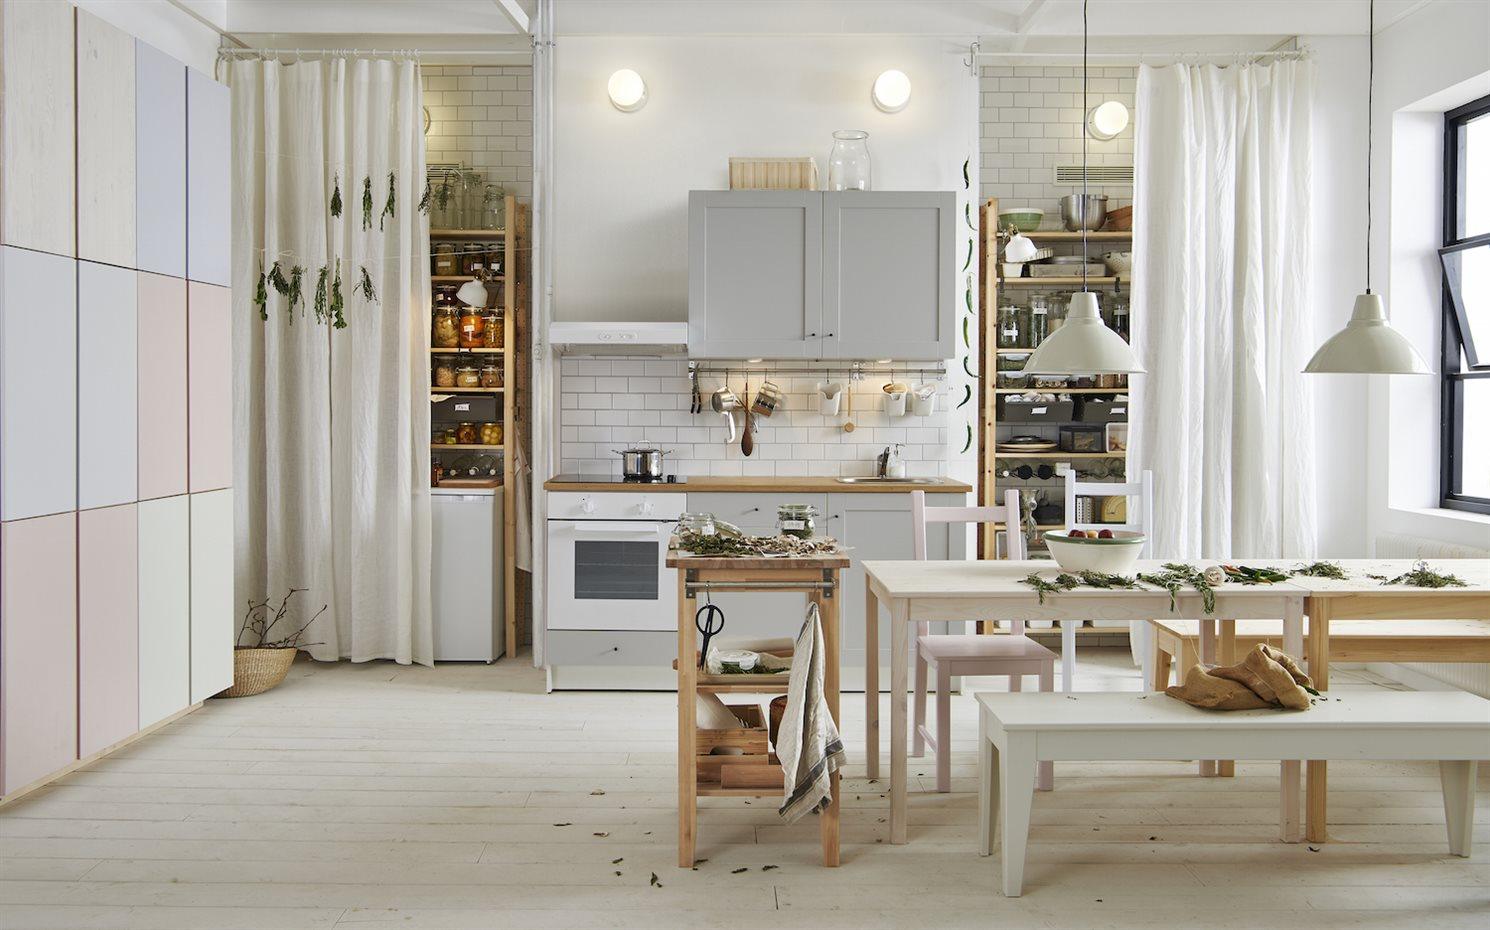 Ikea catalogo armarios catalogo armarios ikea with cajones para armarios ikea a precios pero - Ikea armarios de cocina ...